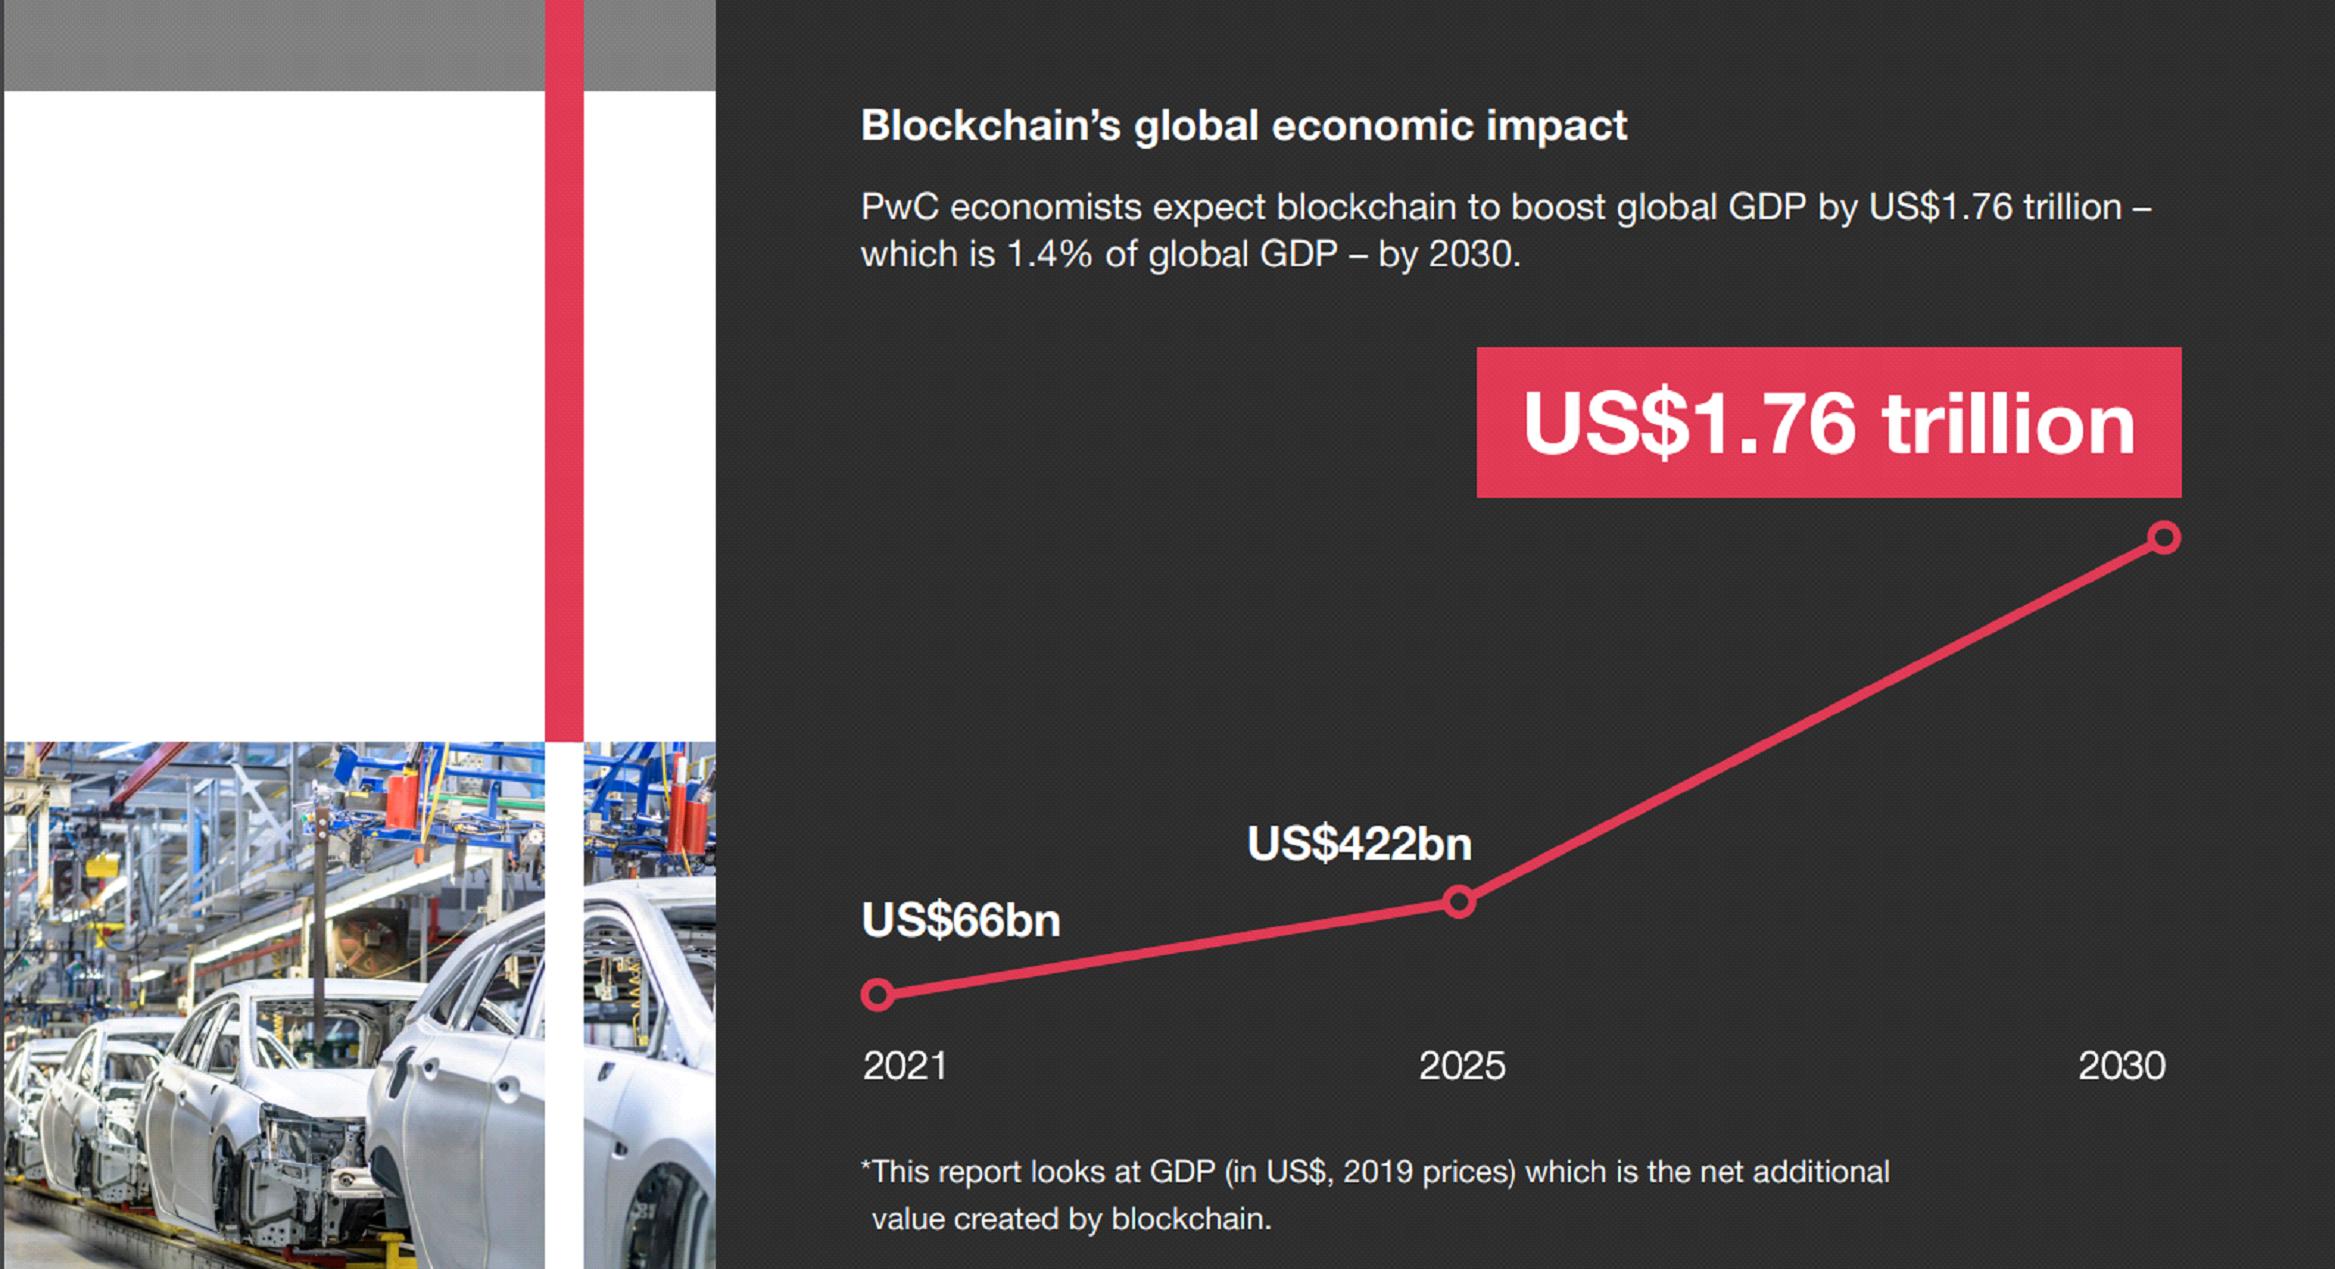 Milijarde za BDP u 2021, bilioni u 2030